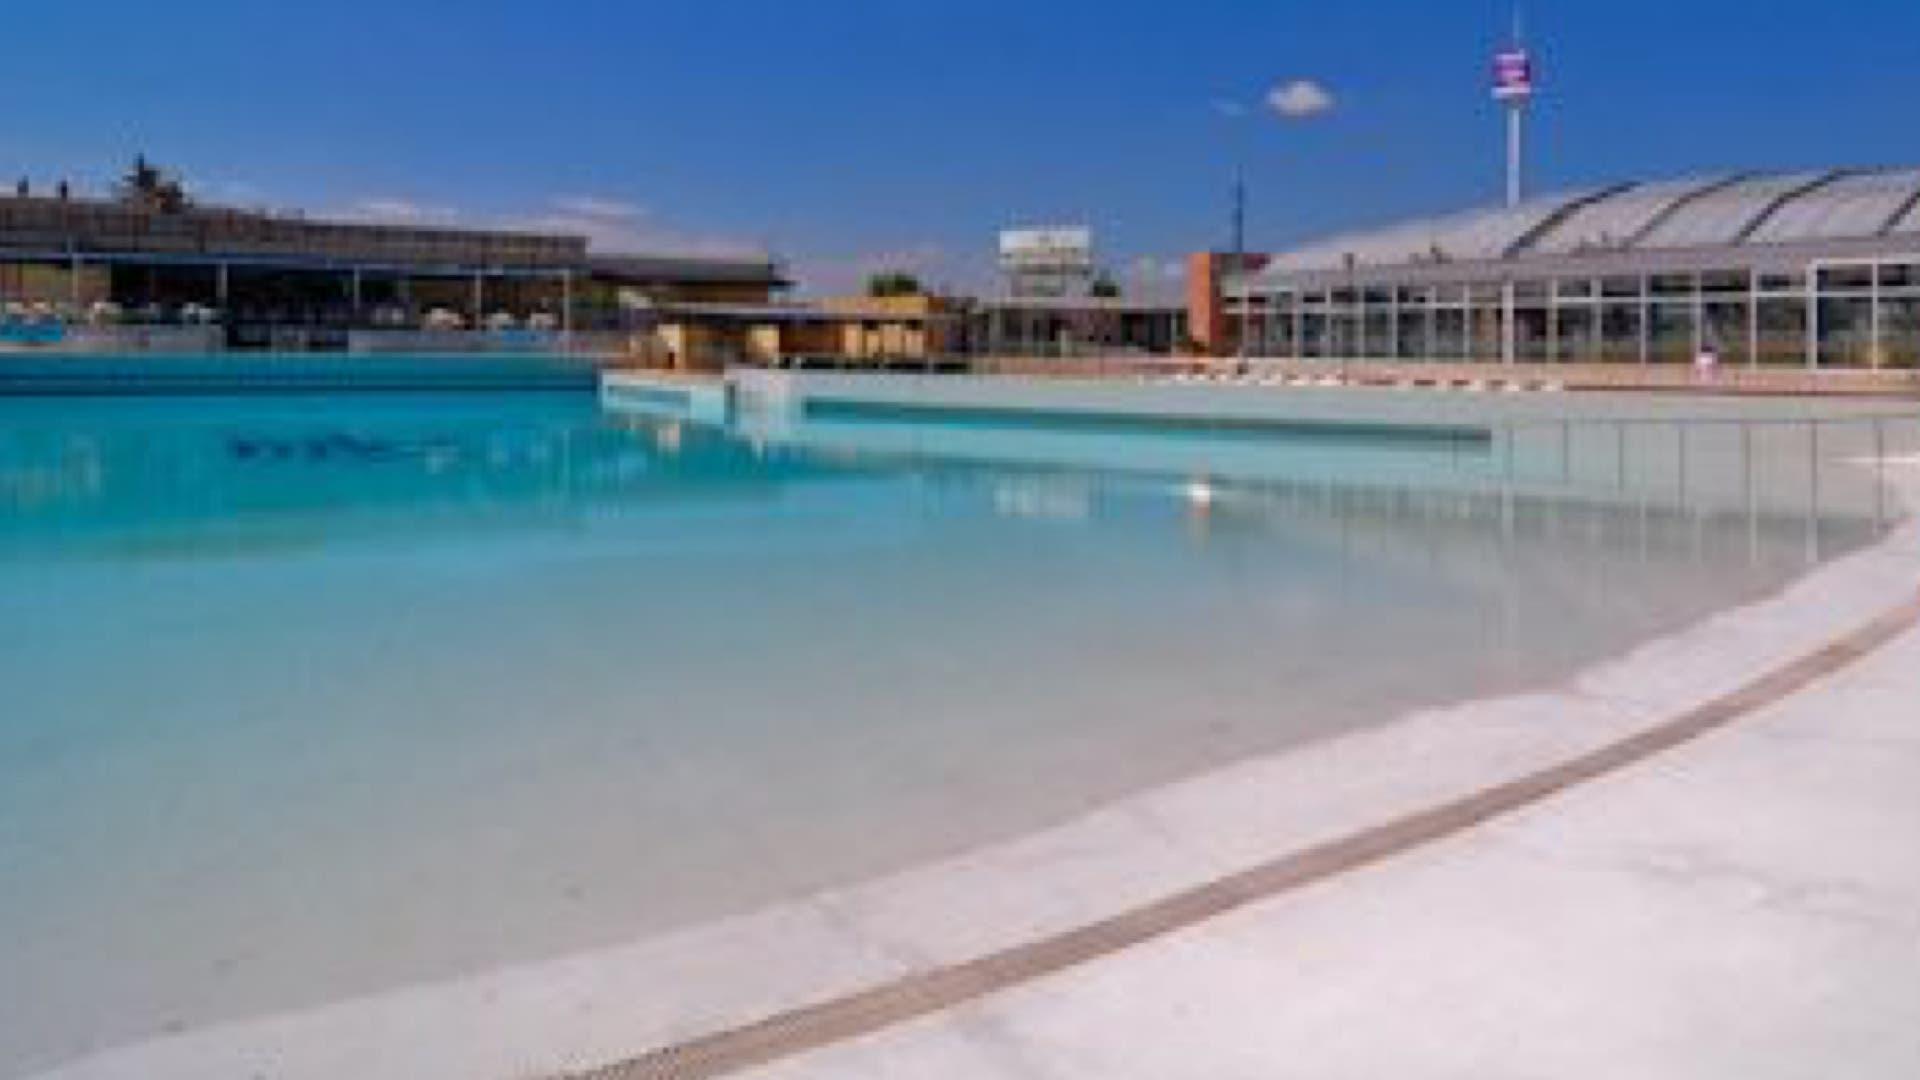 Fotos piscina de loeches